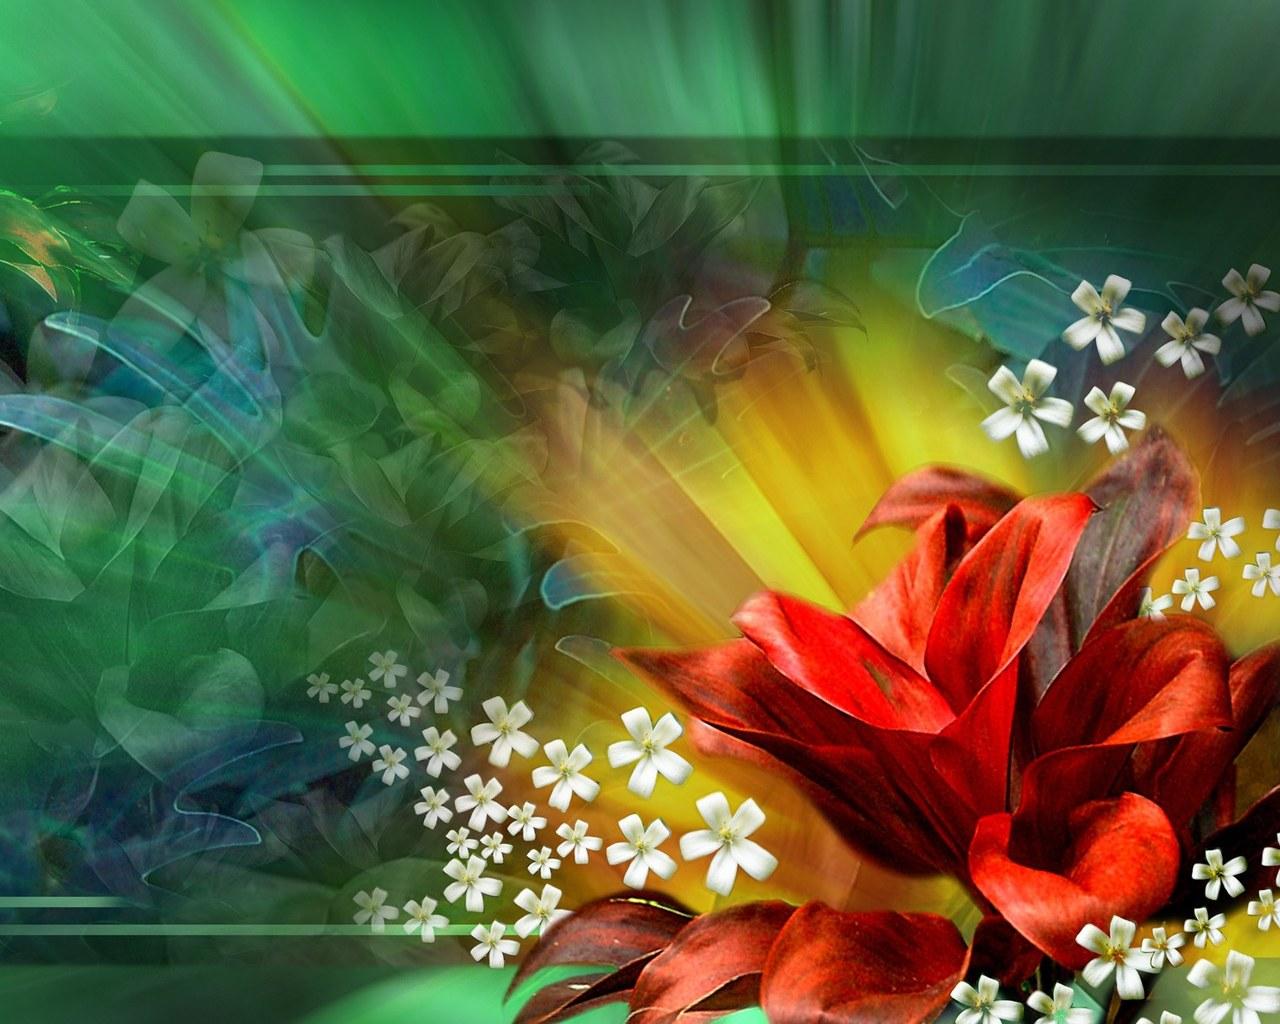 Desktop Nature wallpaper 3d Animated Desktop Animated Desktop 1280x1024